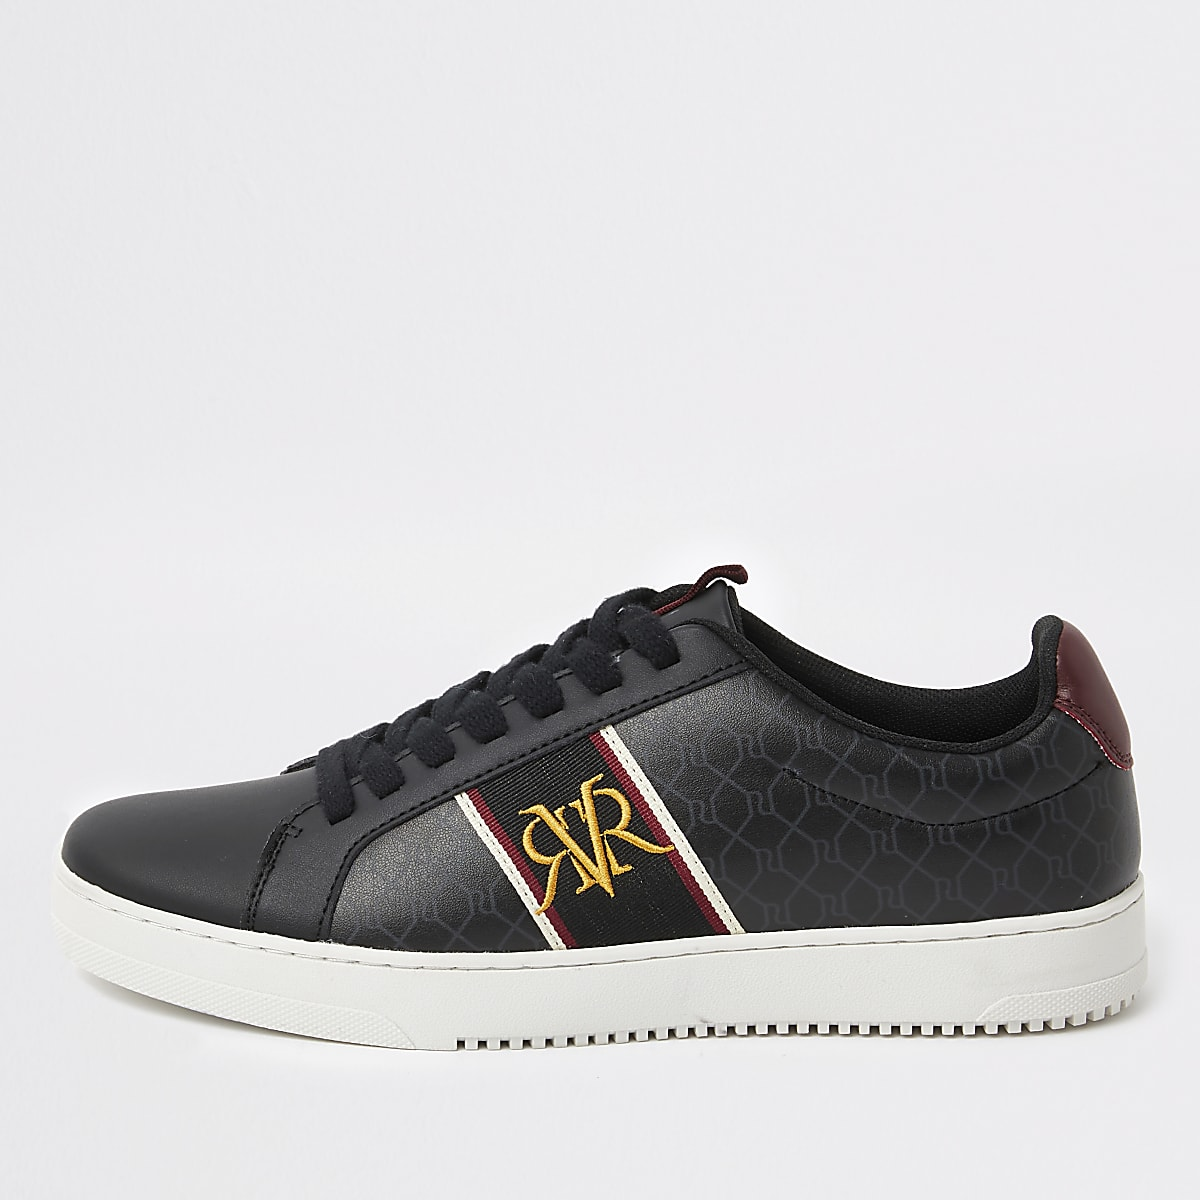 Zwarte sneakers met RI-monogram